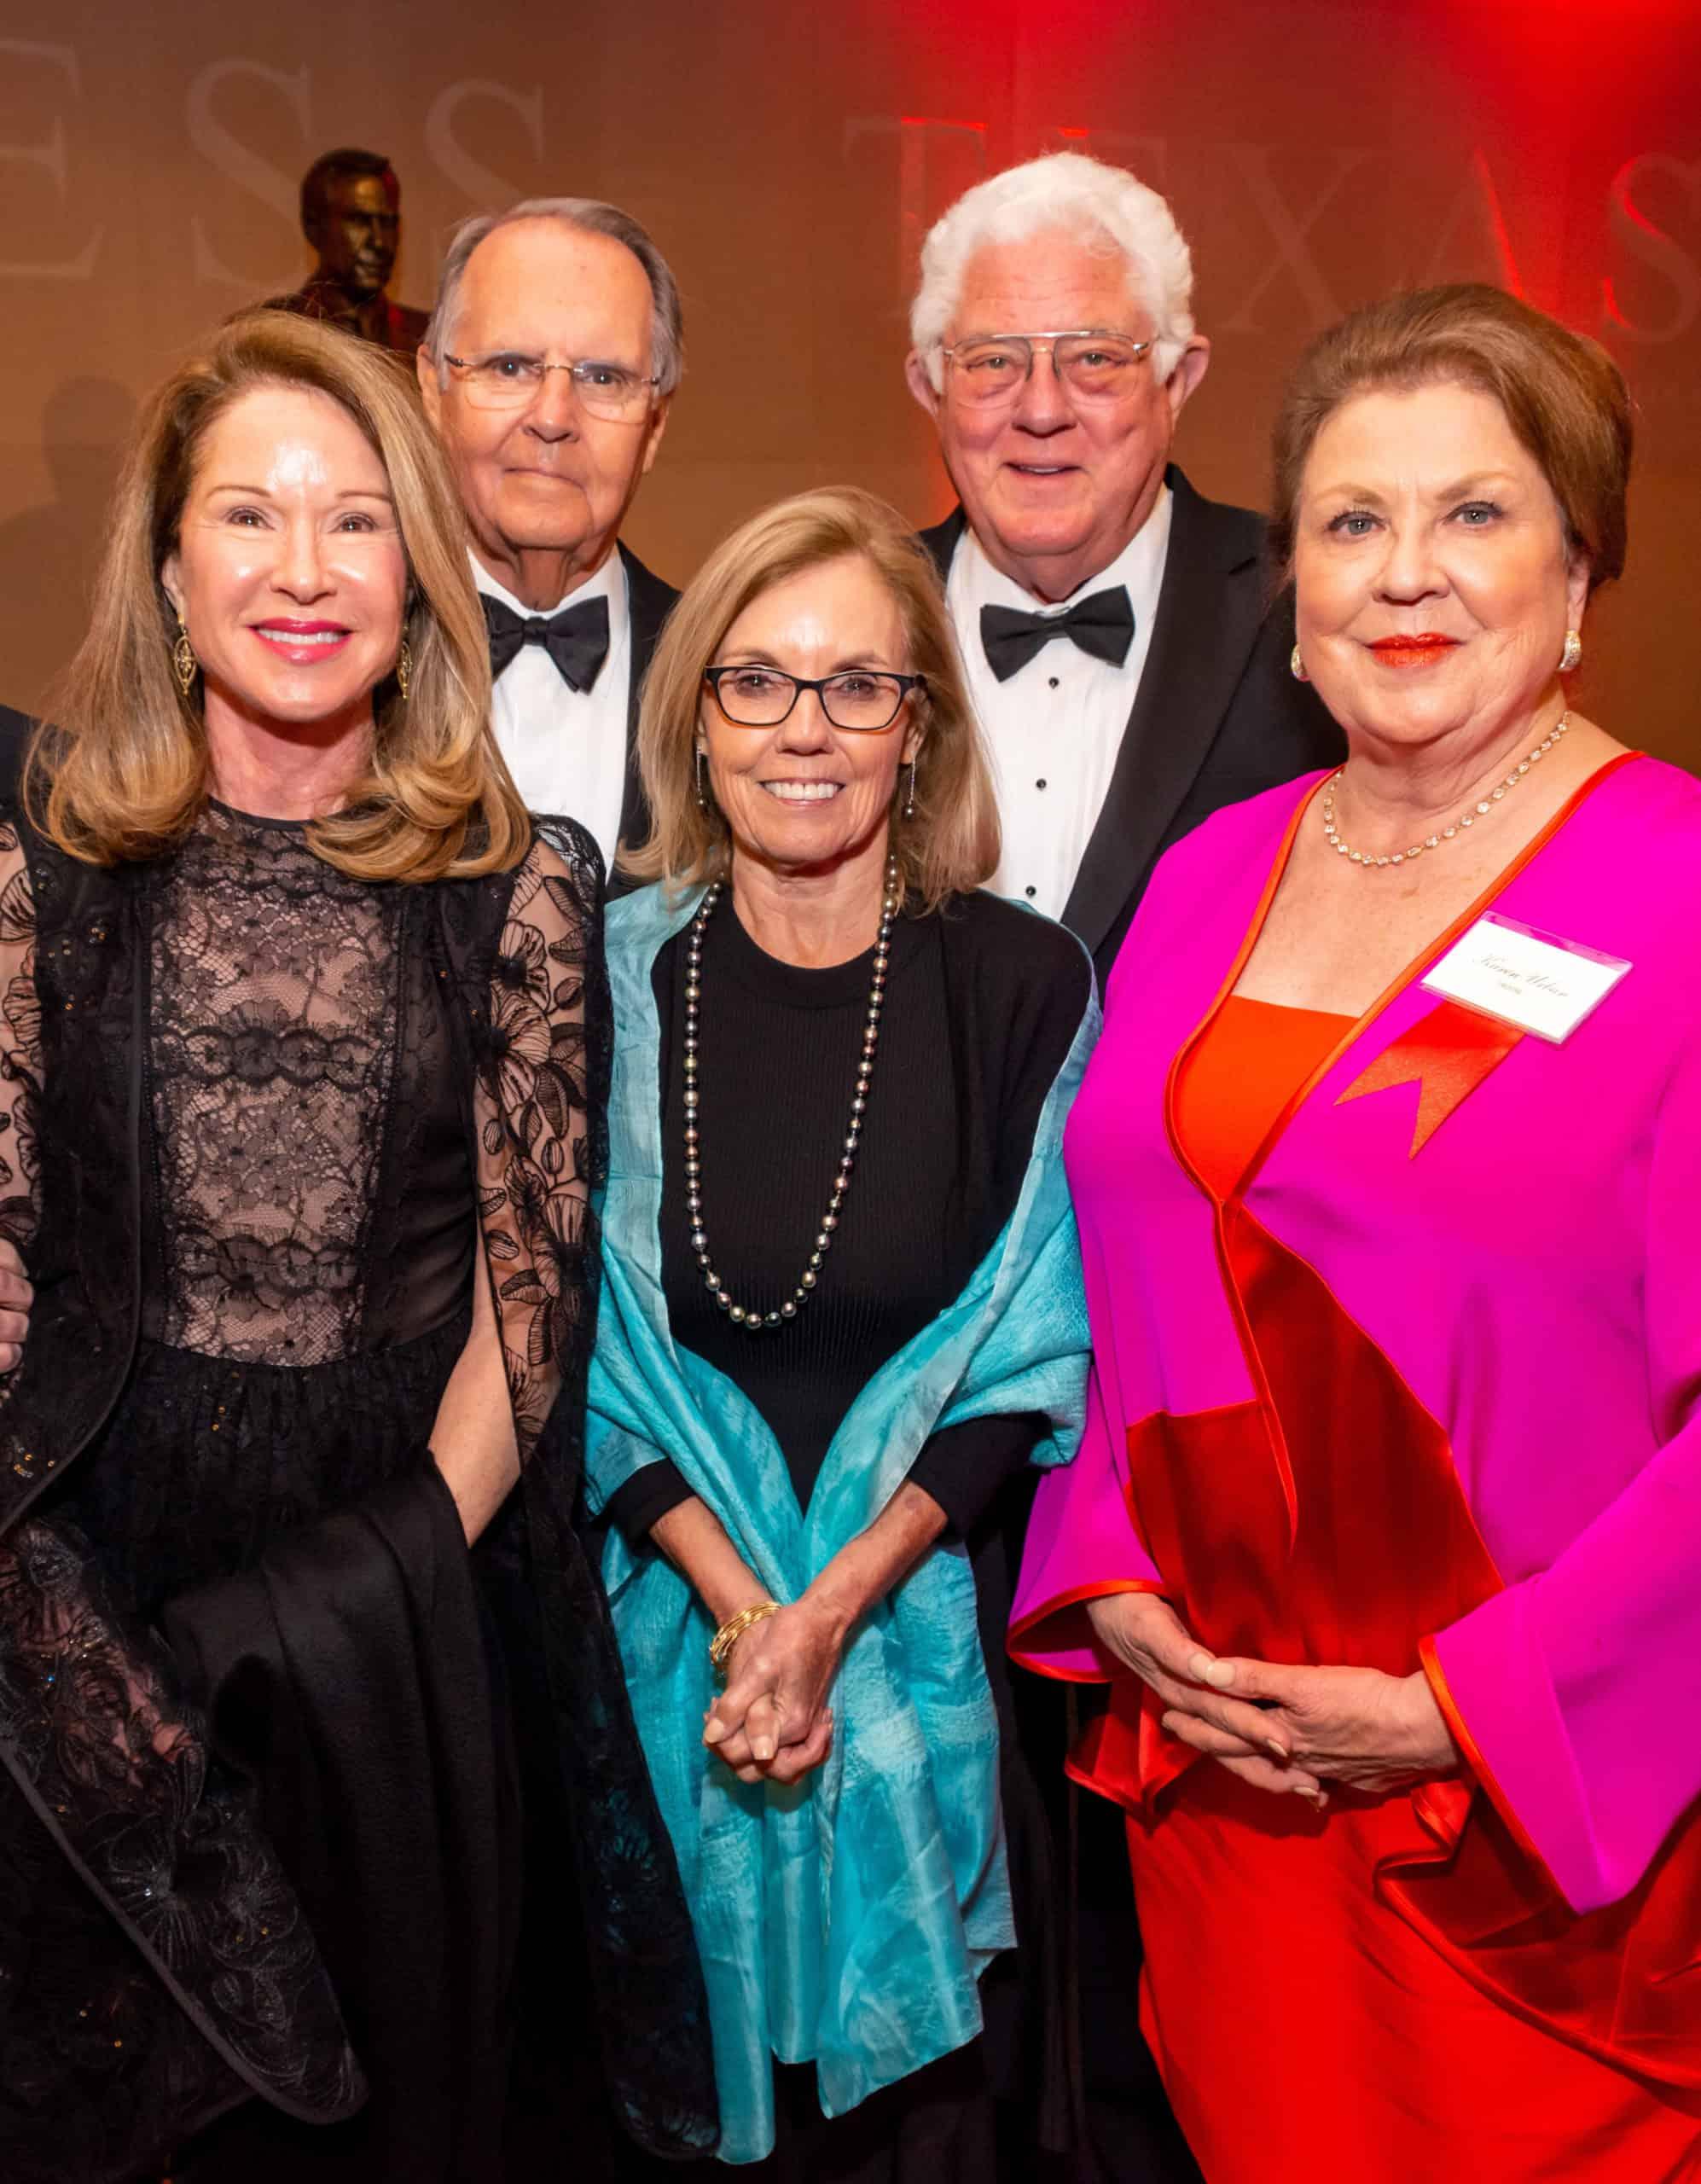 Pam Leshin, Al and Janet Jones _ Larry and Karen Urban